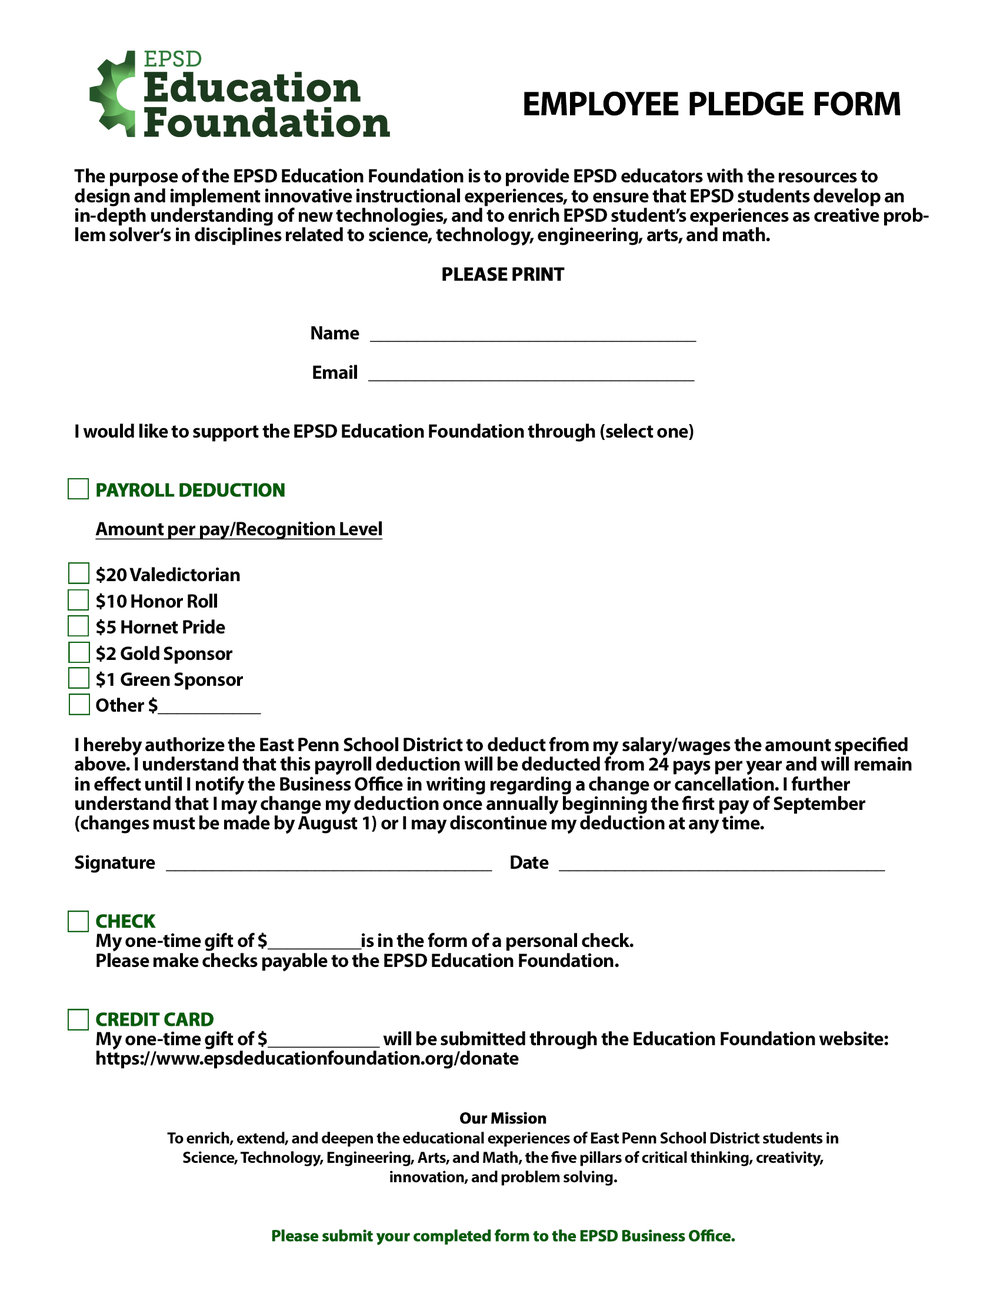 Employee Pledge Form.jpg